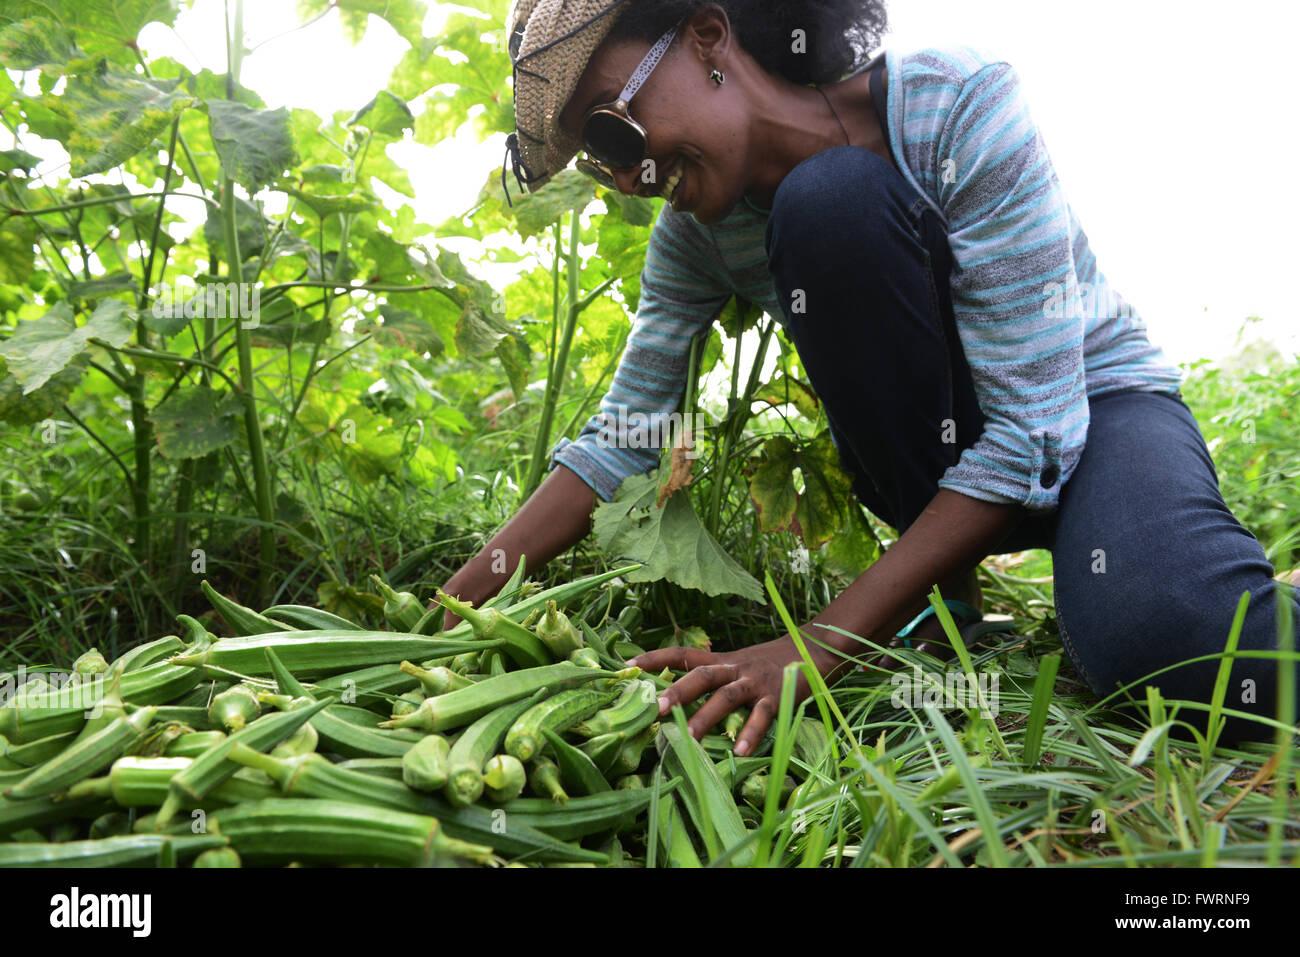 Okra harvest in Humera, Ethiopia. - Stock Image